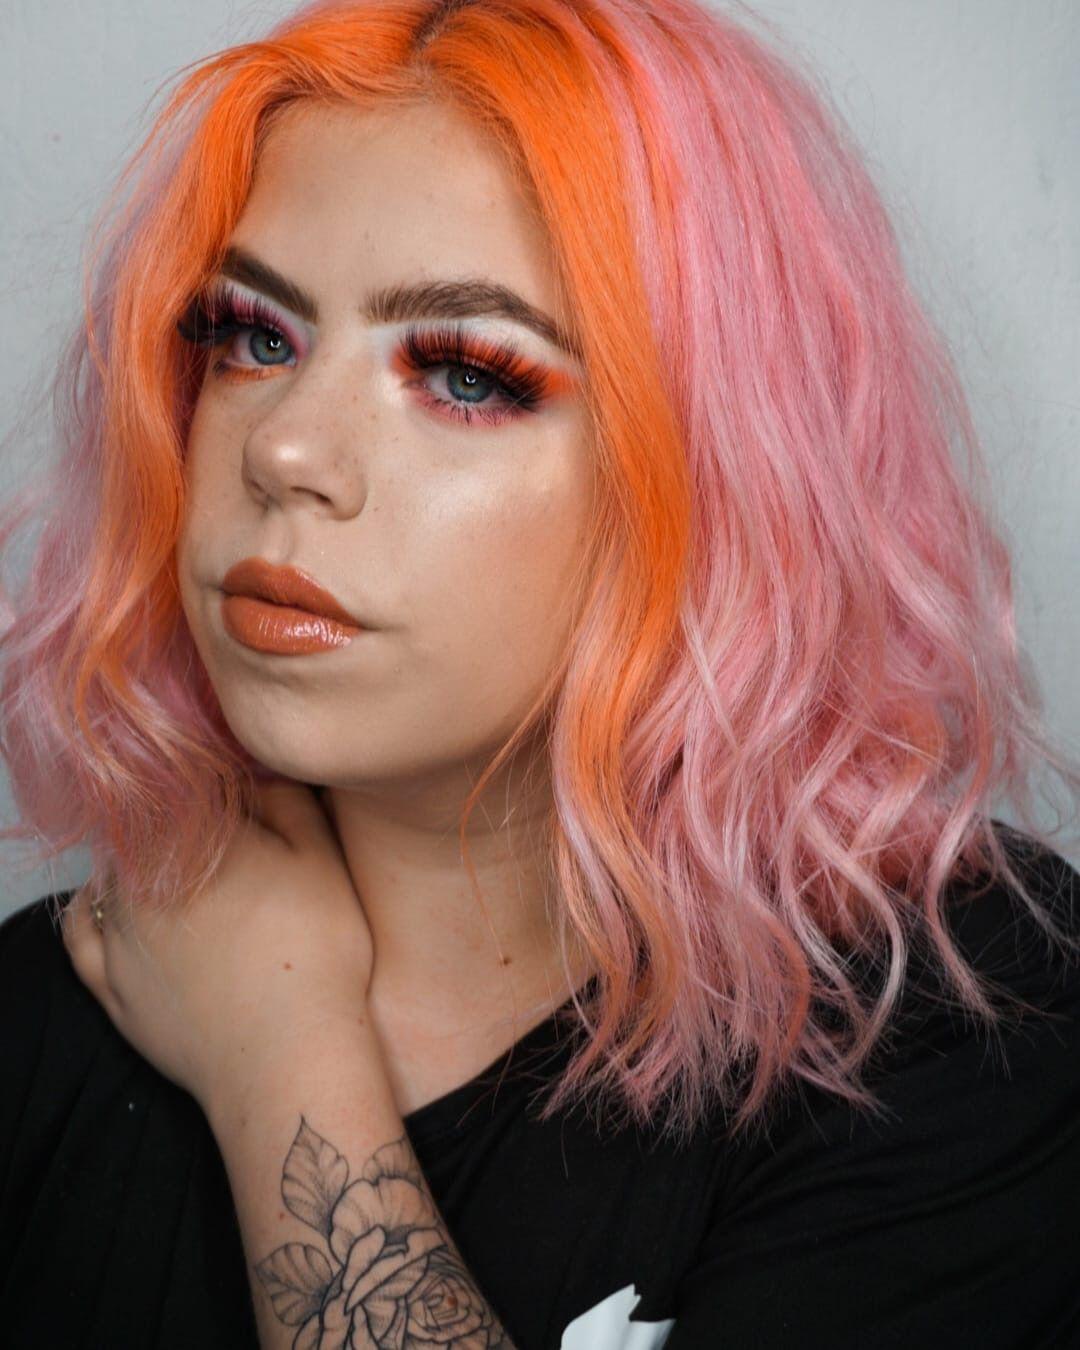 Pin By Rachel K On Hair In 2020 Hair Inspo Color Stylish Hair Colors Dyed Hair